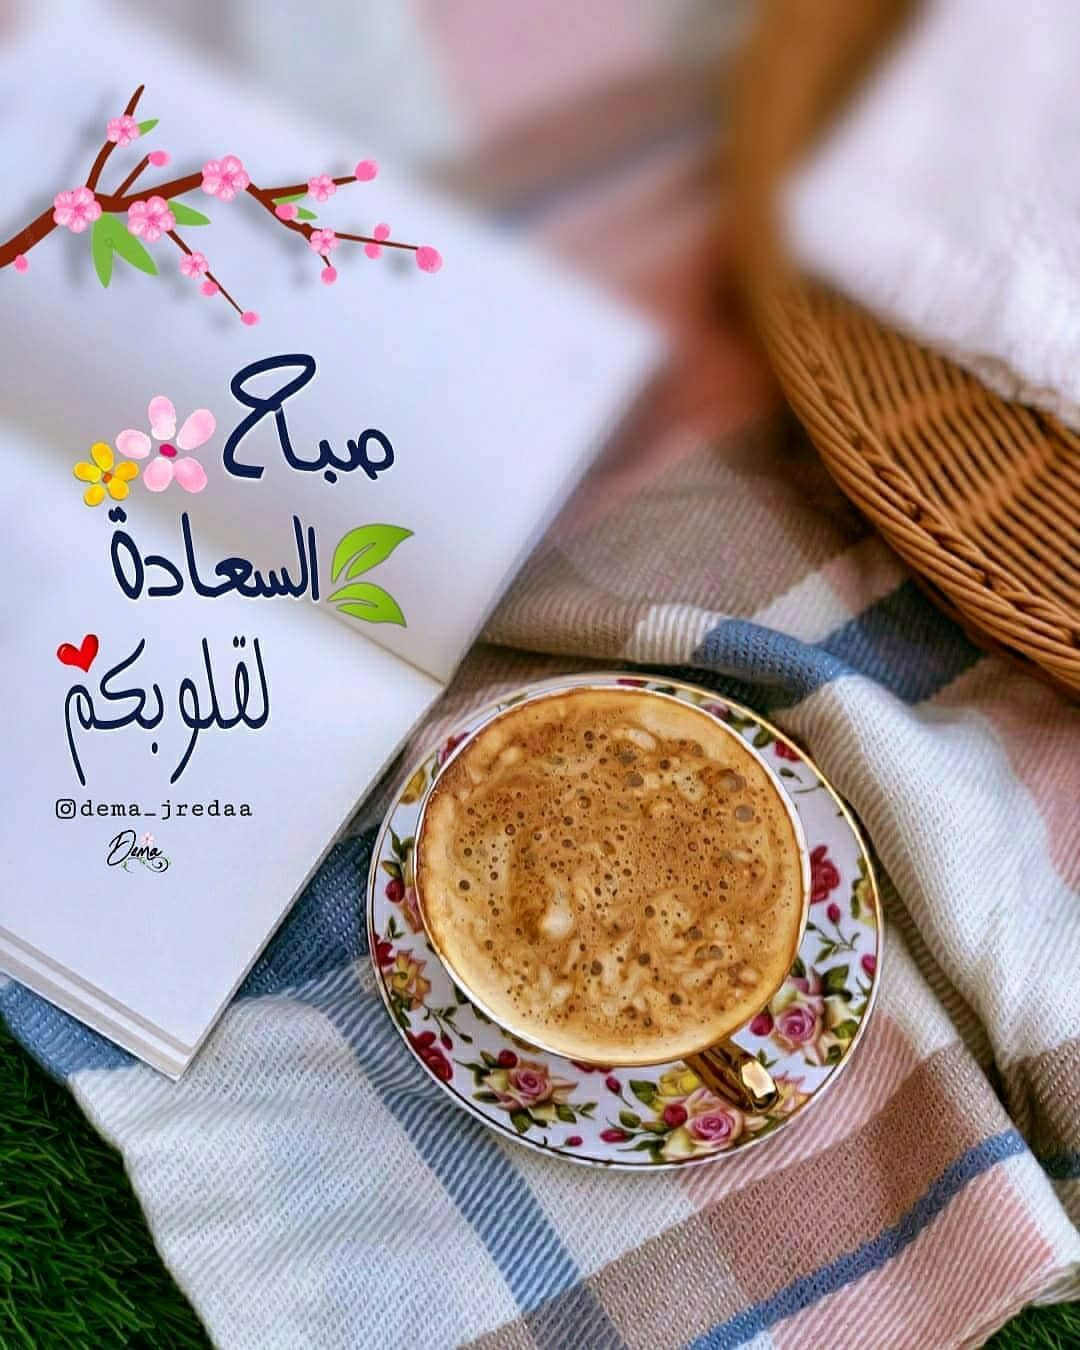 Pin By I Love U On صباحكم جميل كابتسامتكم Good Morning Greetings Good Morning Gif Morning Greeting